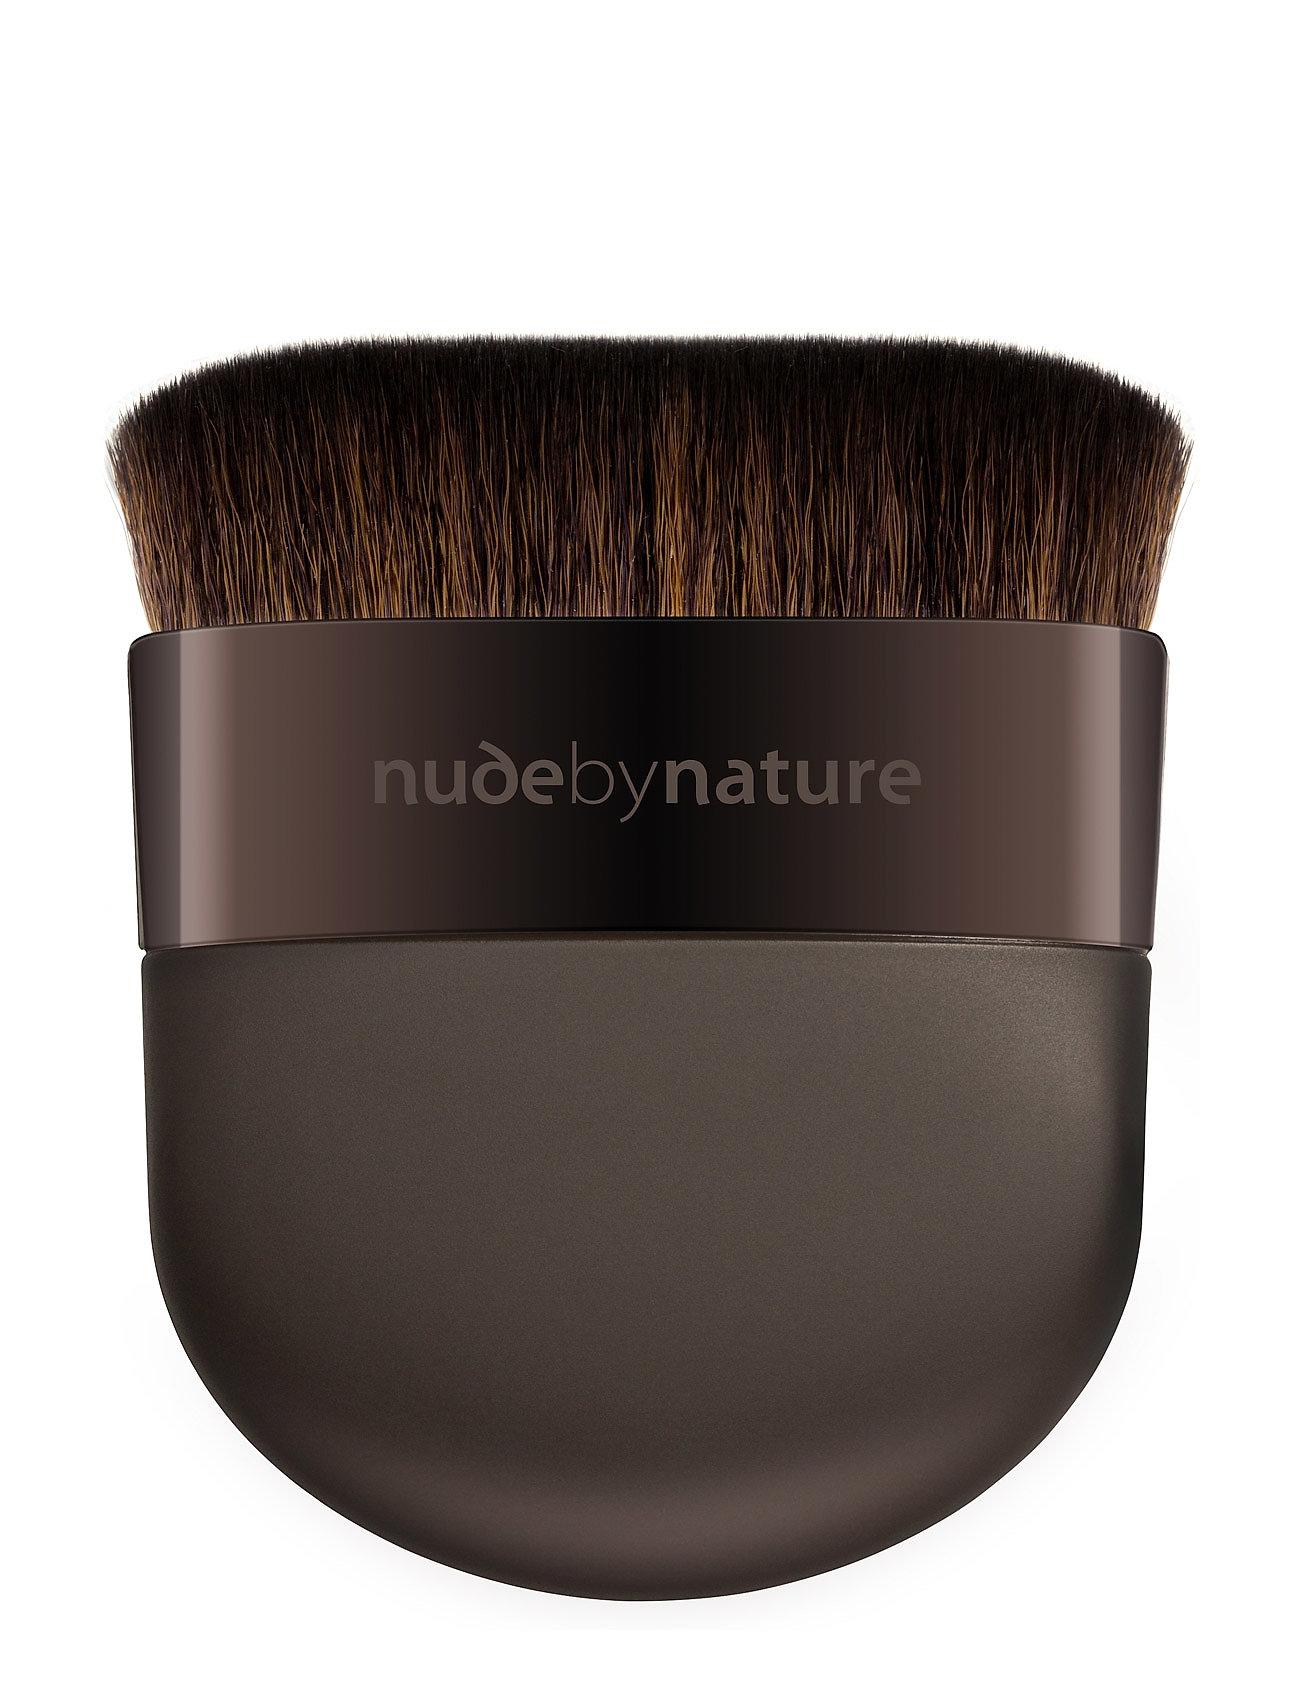 Image of Brushes 13 Ultimateperfecting Brush Ansigtsbørste Makeup Nude Nude By Nature (2806004979)